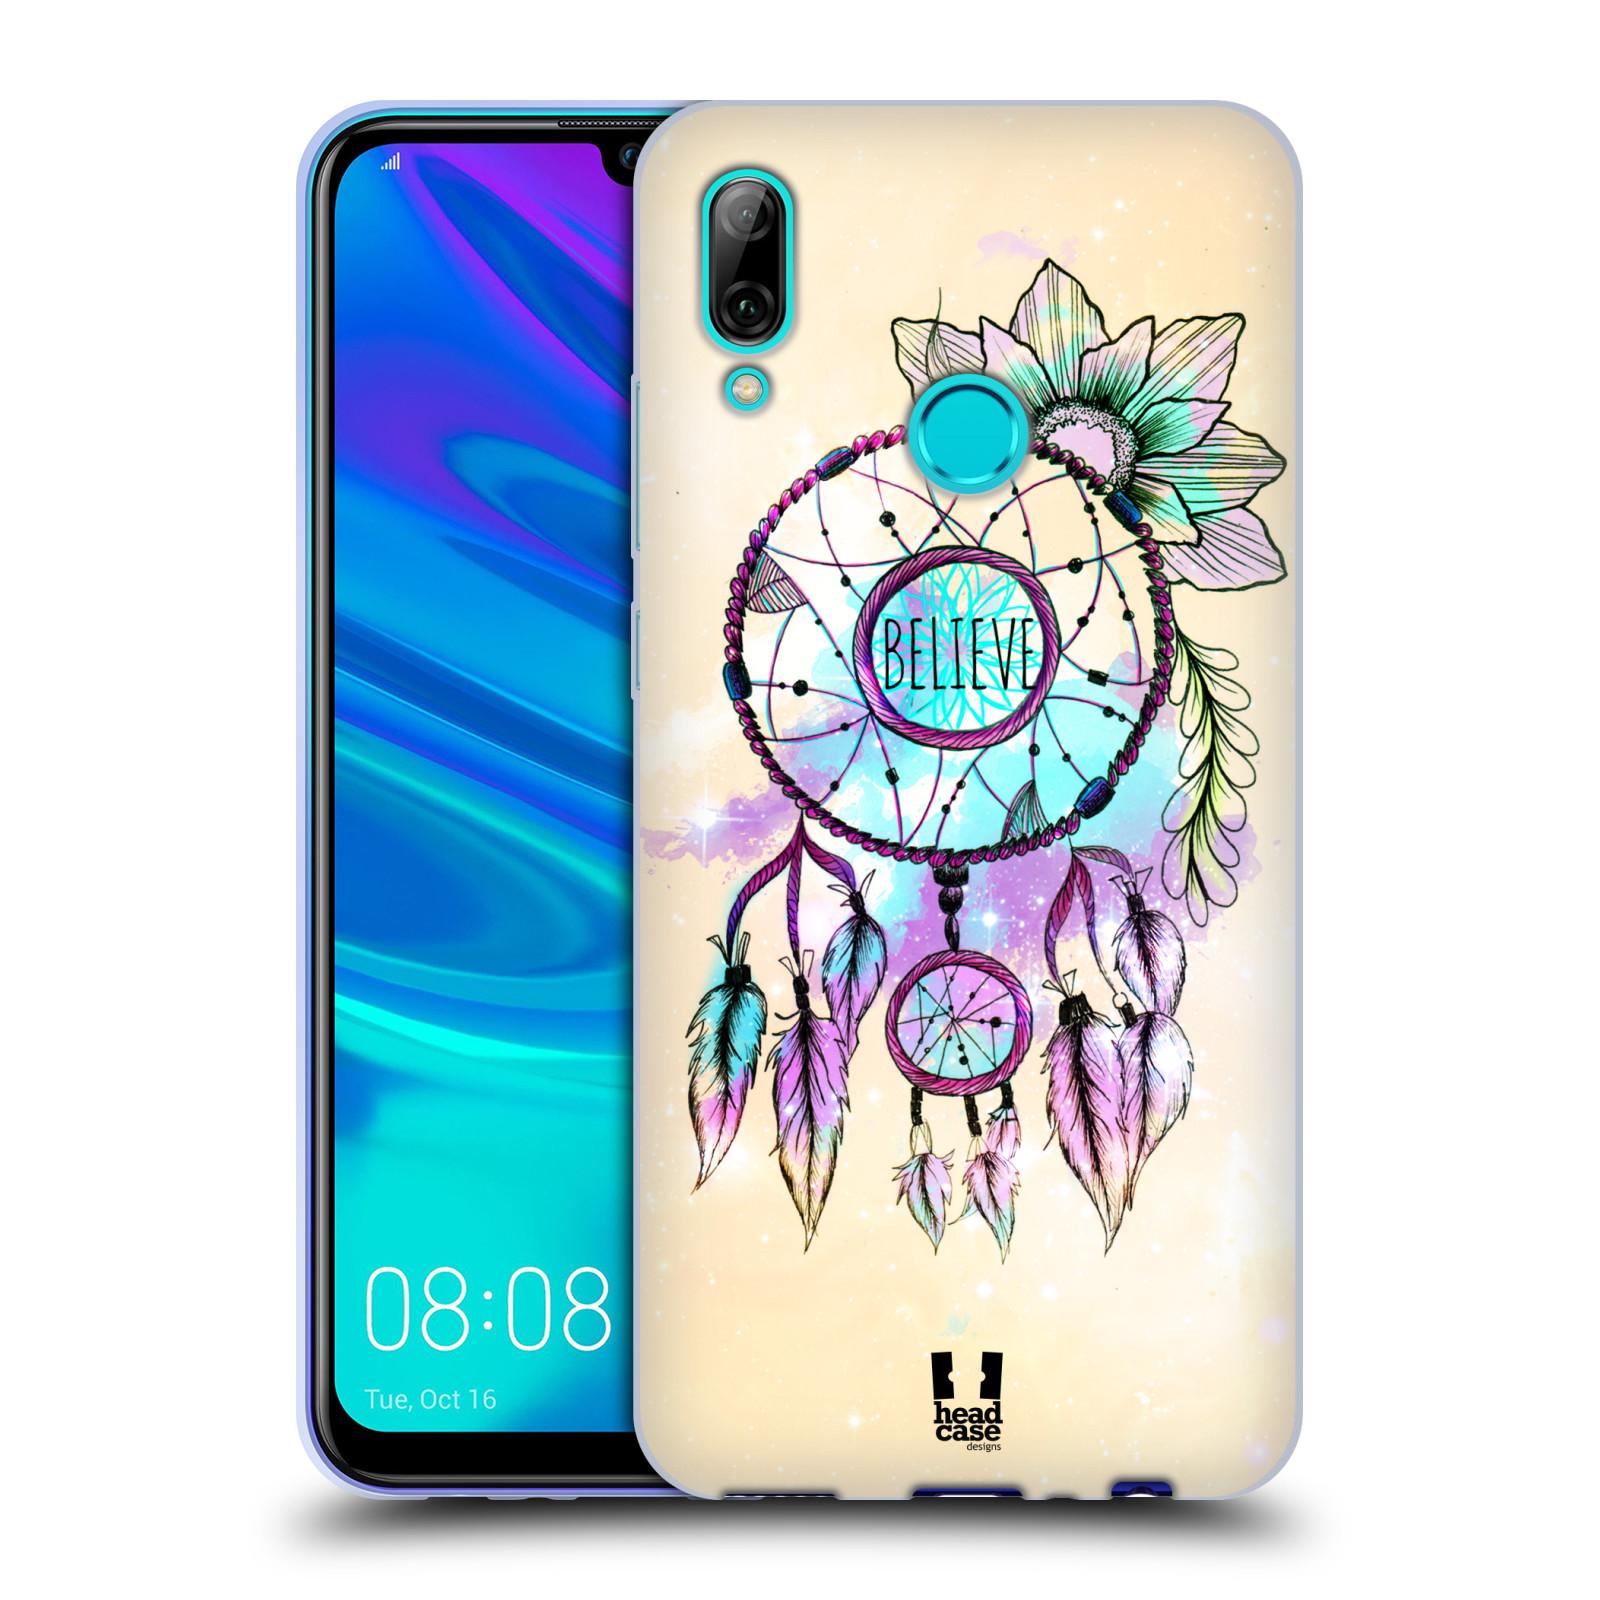 Silikonové pouzdro na mobil Huawei P Smart (2019) - Head Case - MIX BELIEVE